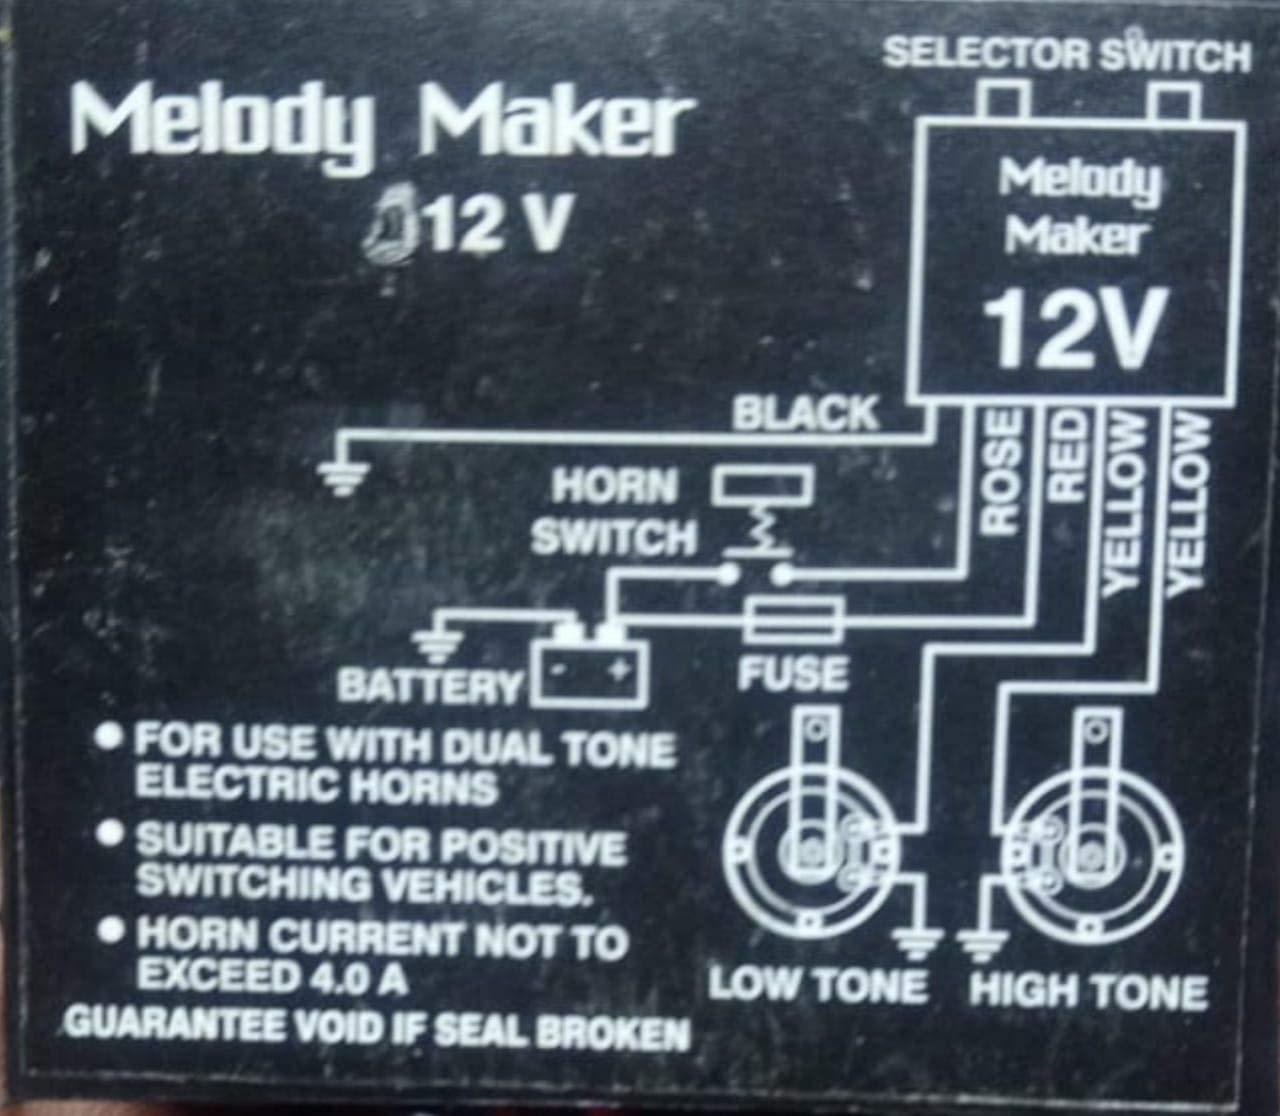 [GJFJ_338]  UNO MINDA P886019PS Melody Maker with 24- Buy Online in Burkina Faso at  Desertcart | Melody Maker Wiring Diagram |  | Desertcart